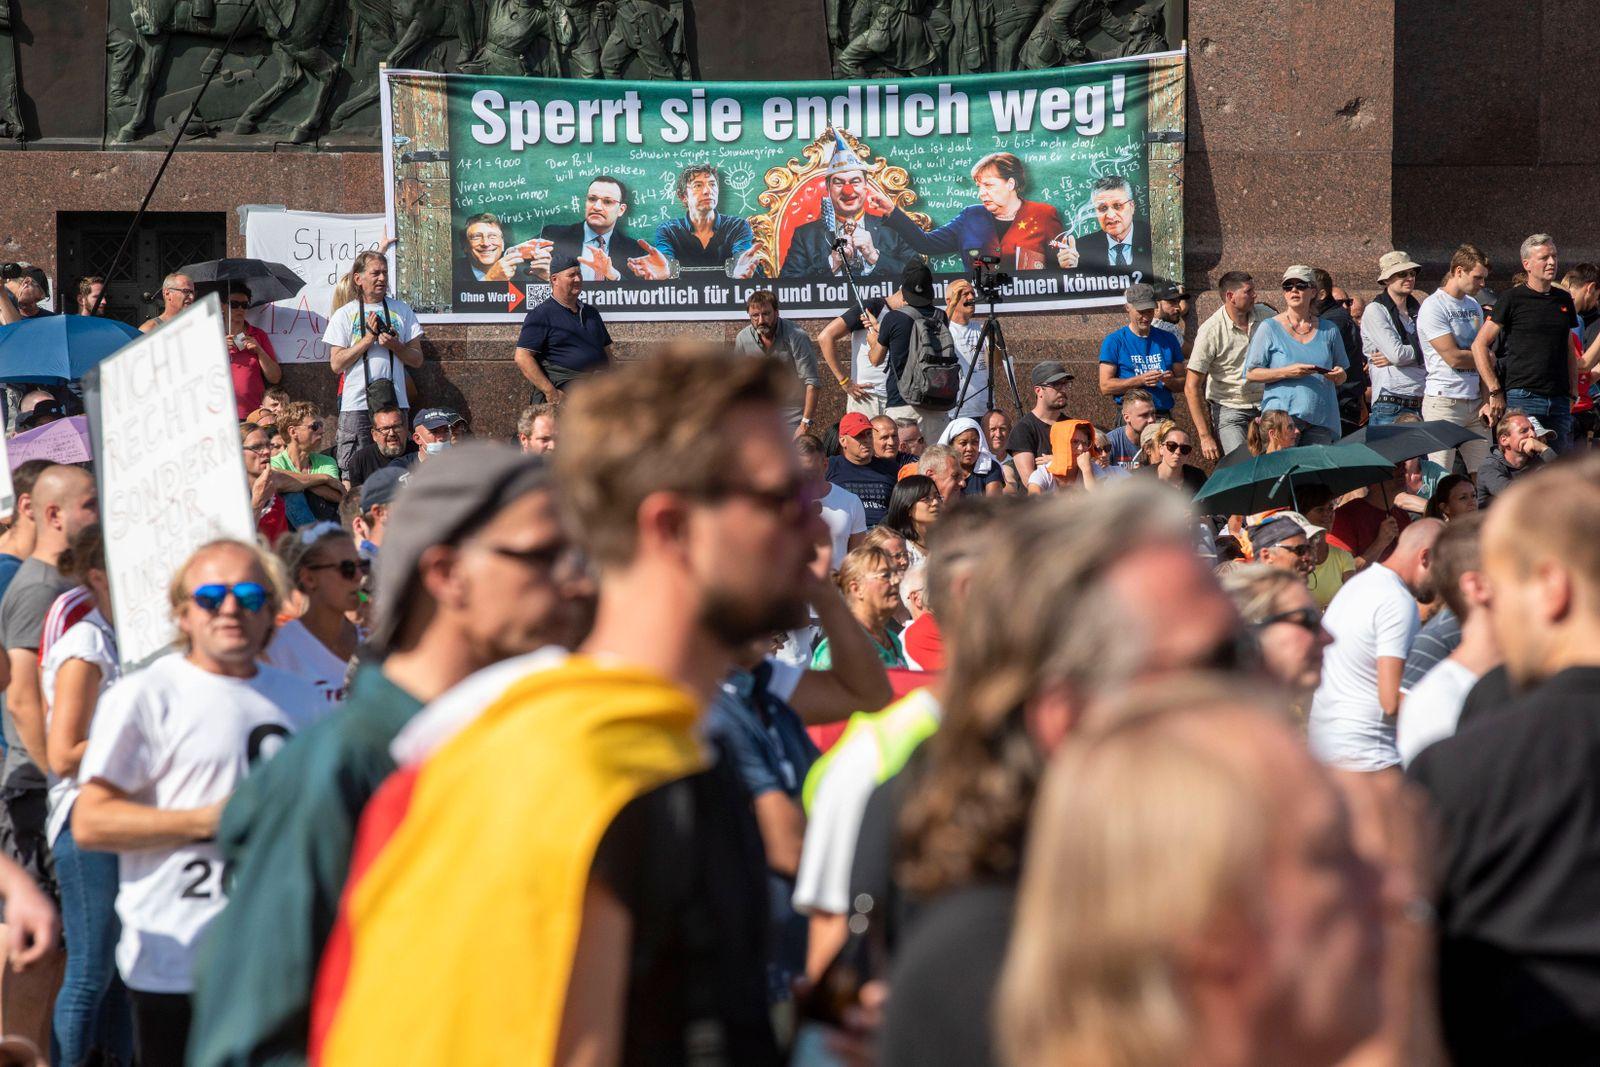 Deutschland, Berlin, Anti Corona Demonstration, Straße des 17.Juni, Siegessäule, 29.08.2020 *** Germany, Berlin, Anti C